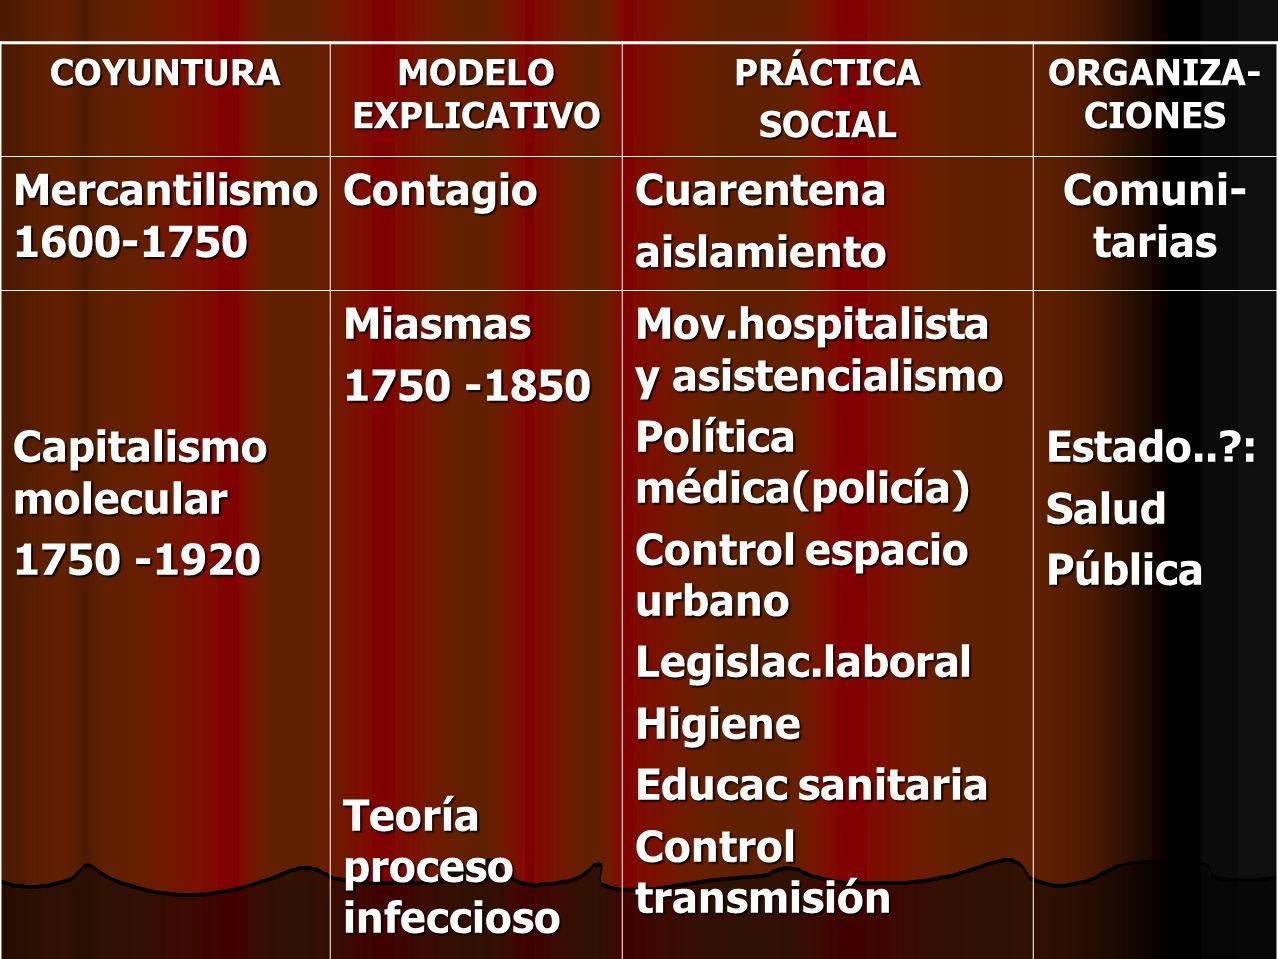 Capitalismo molecular 1750 -1920 Miasmas 1750 -1850